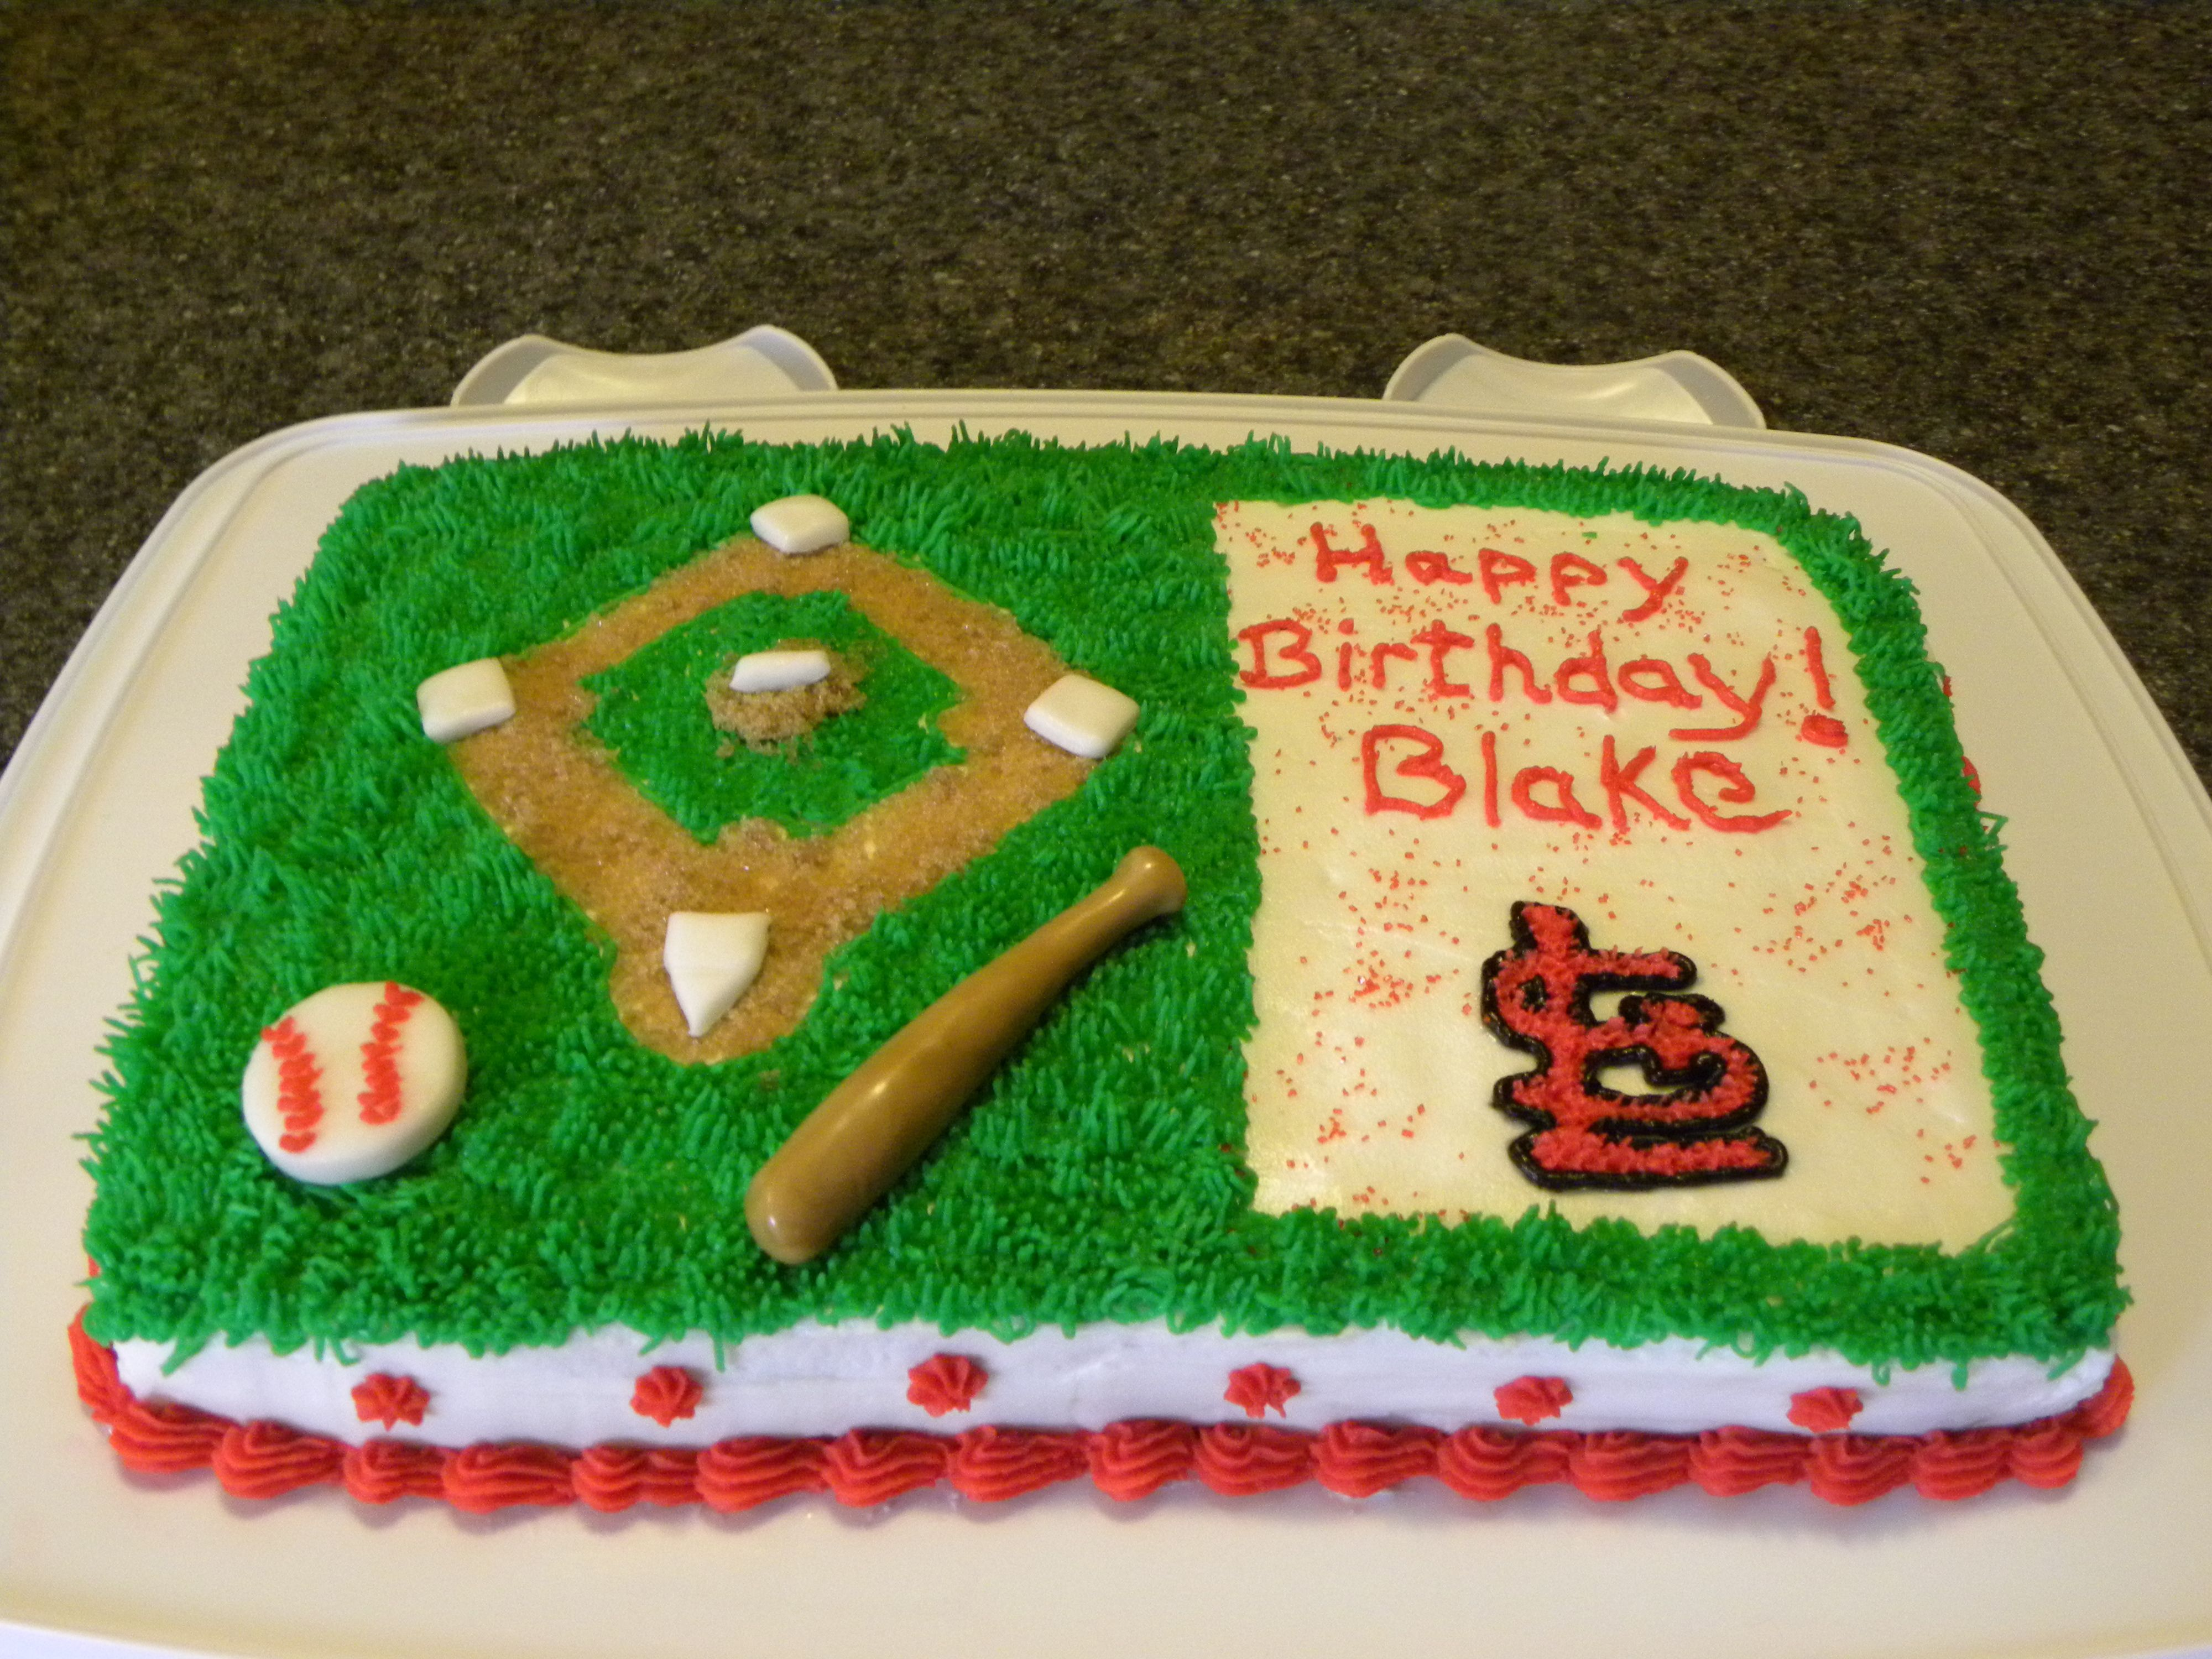 St Louis Cardinals Cake Wonder If I Could Commission Jeni Dancer To